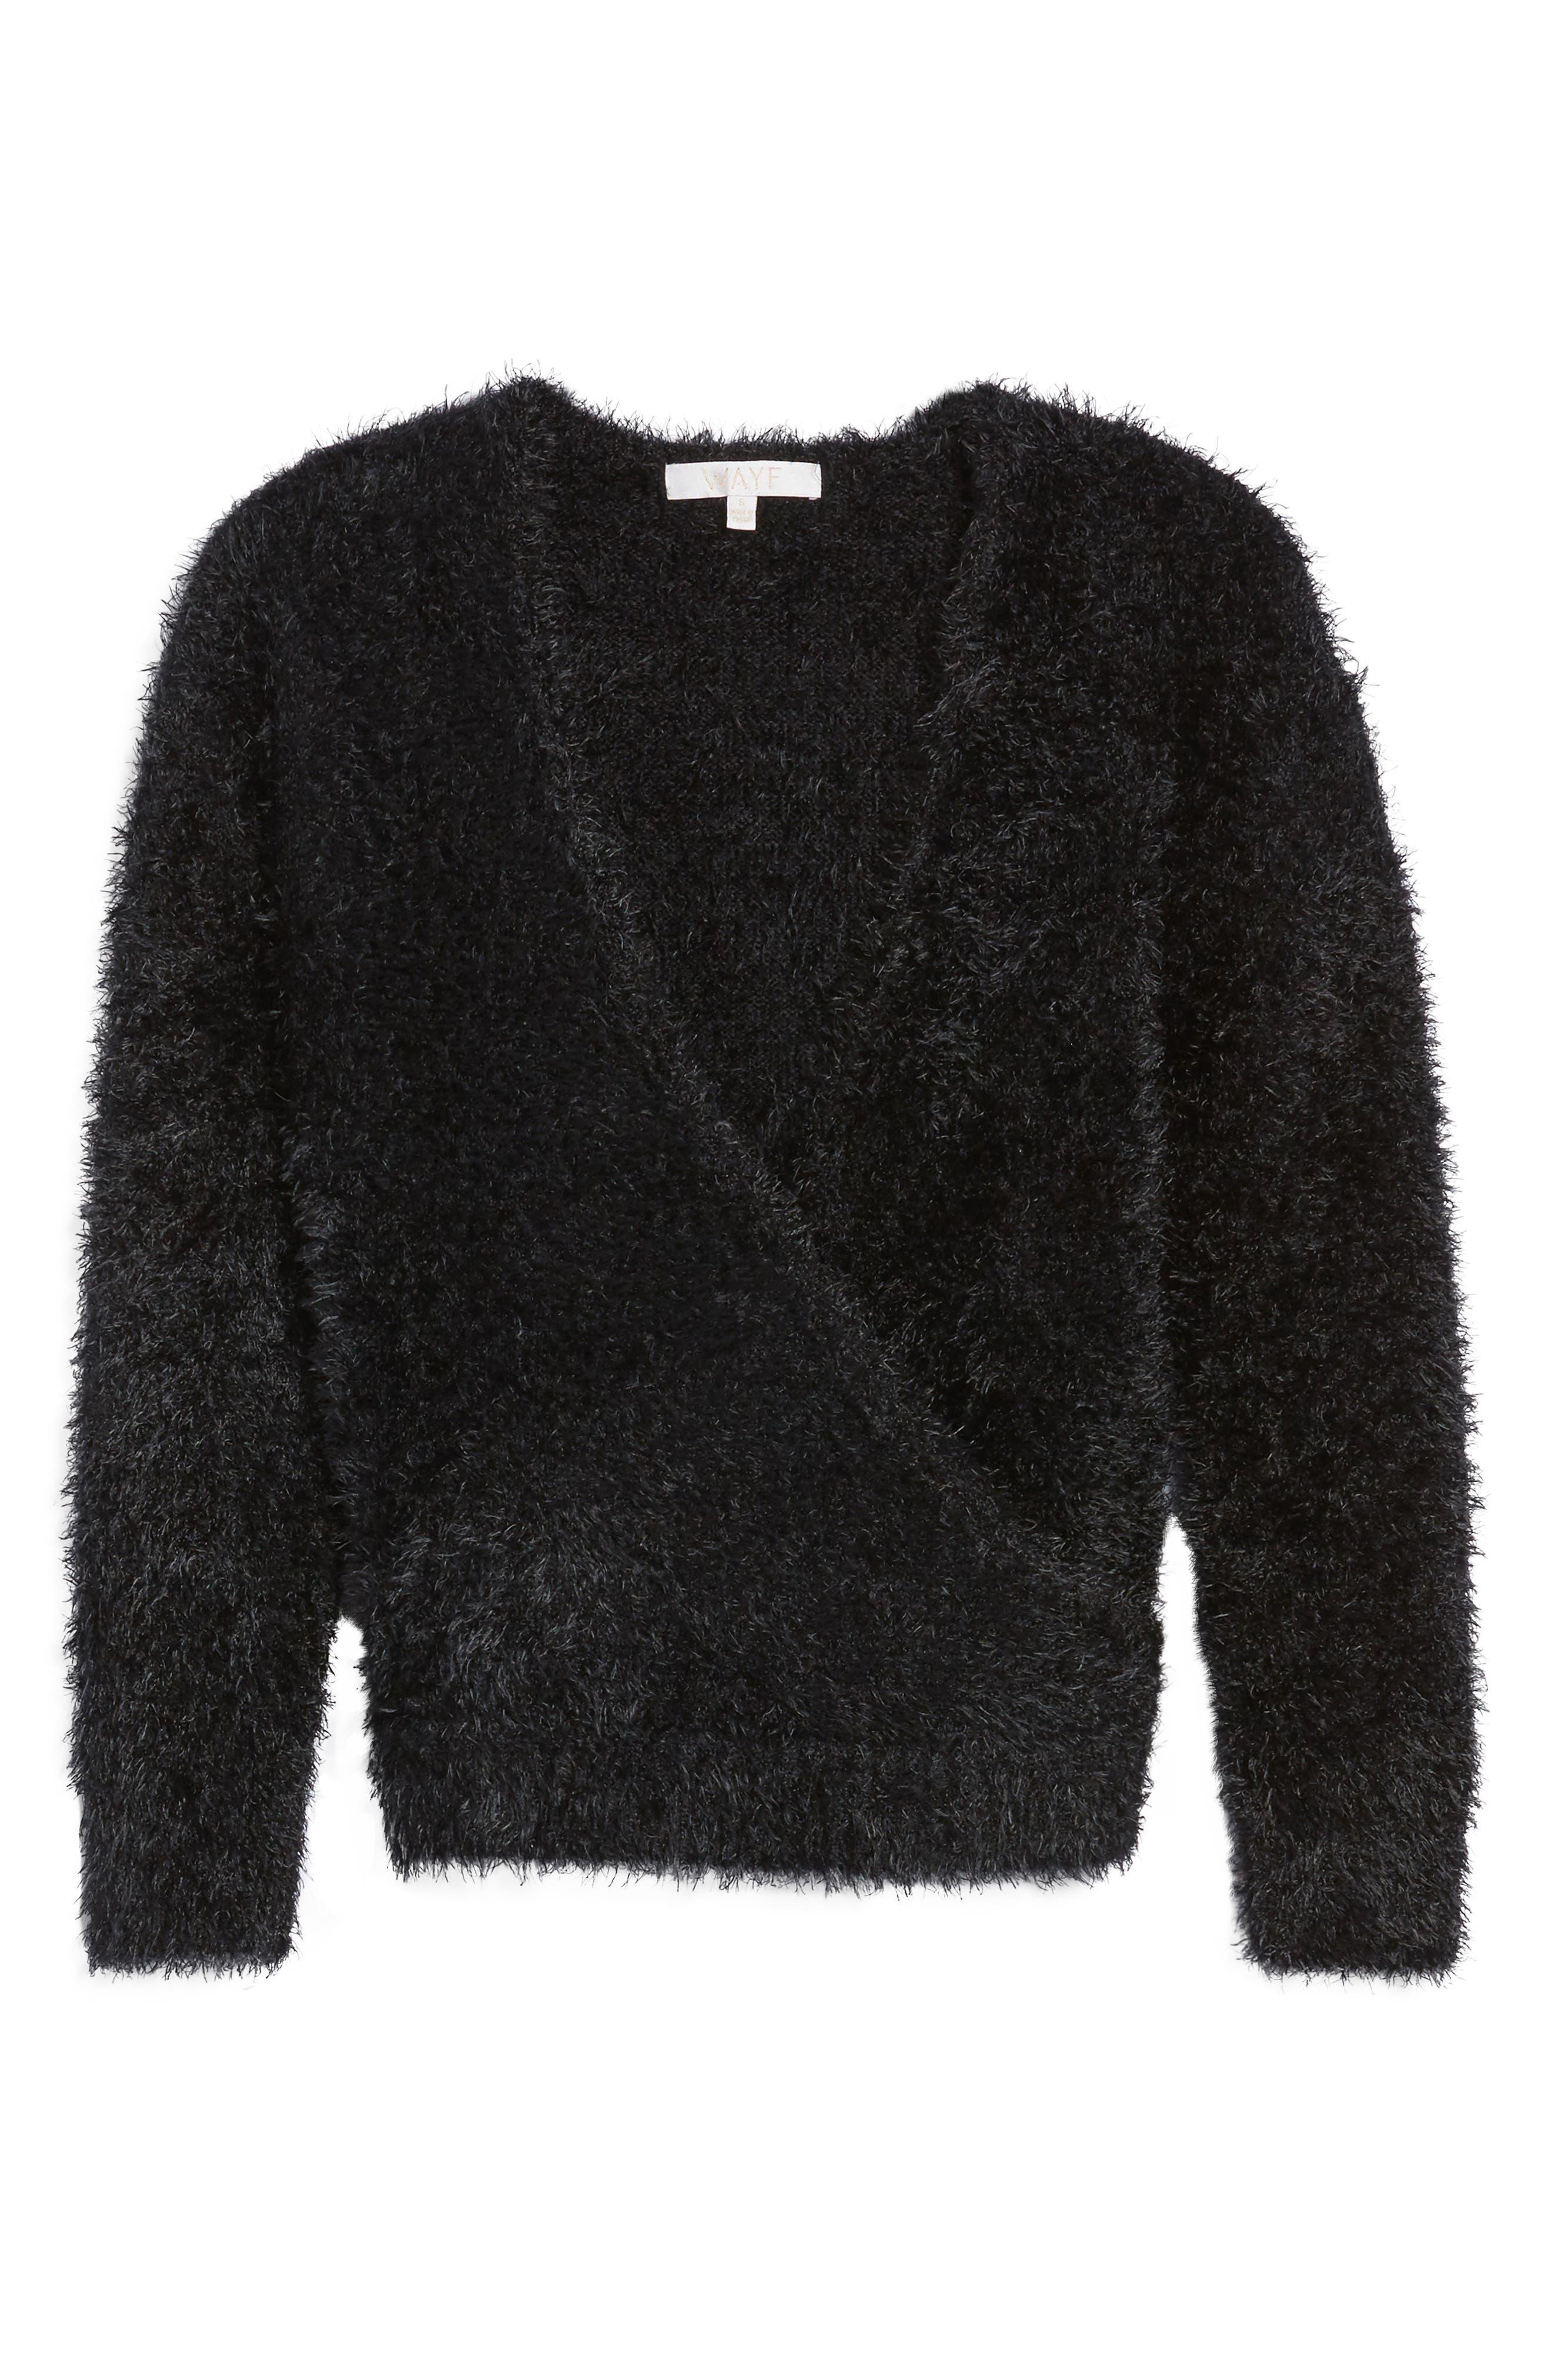 Fuzzy Surplice Sweater,                             Alternate thumbnail 6, color,                             Black